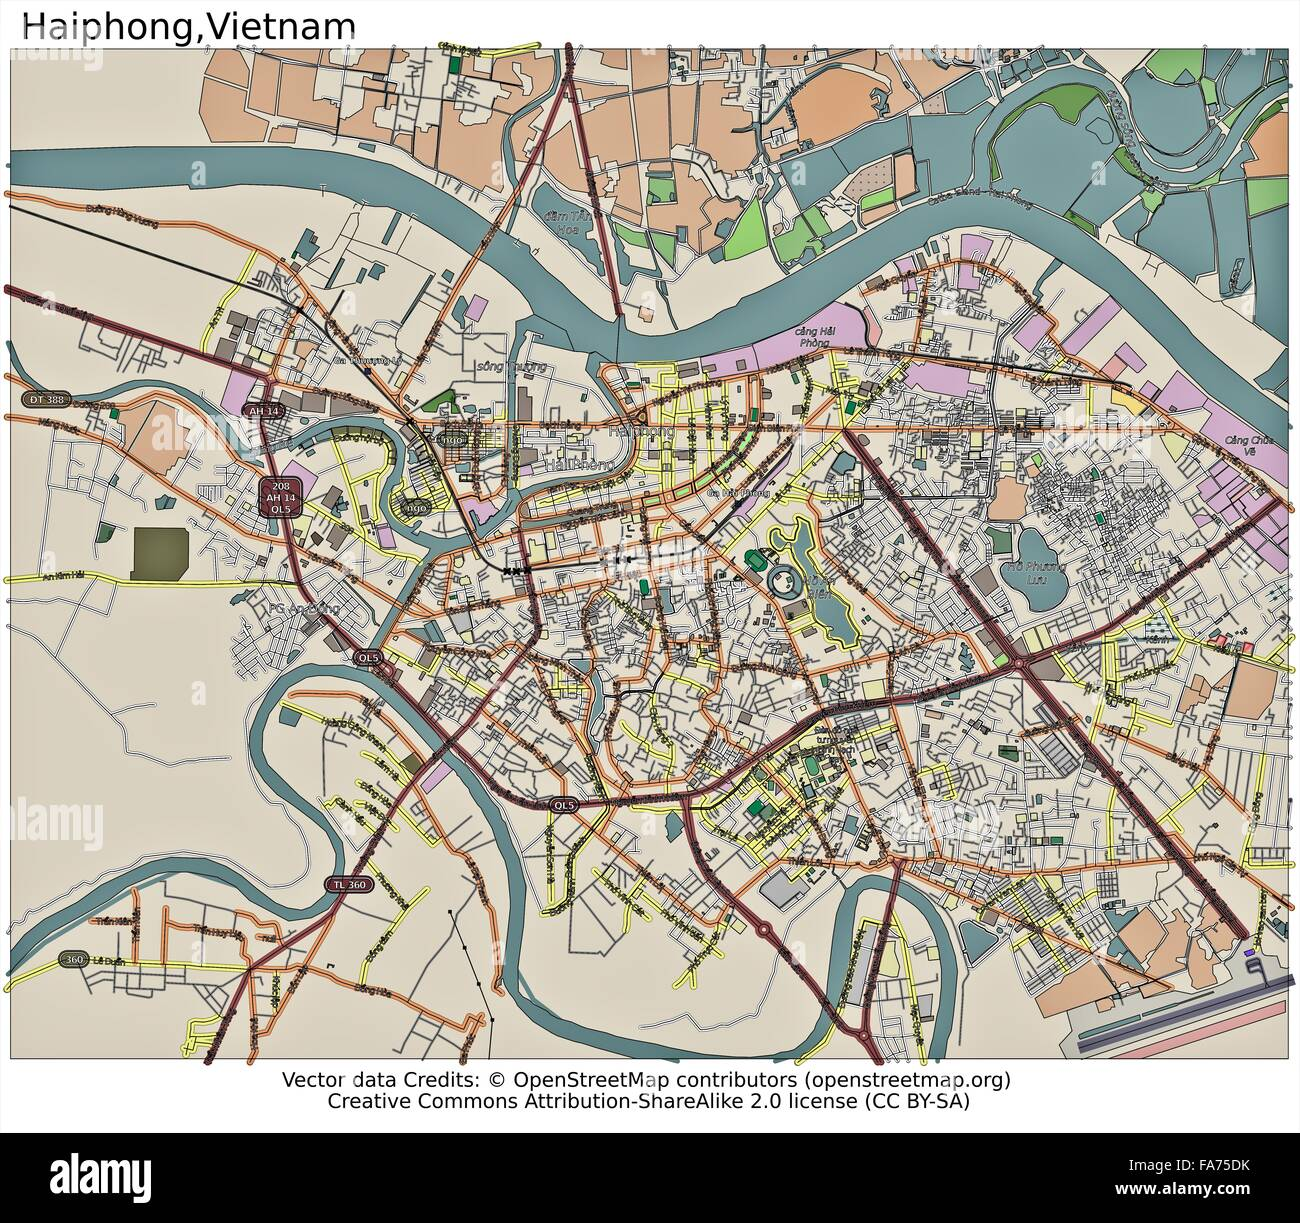 Haiphong Vietnam Map.Haiphong Vietnam Location Map Stock Photo 92356367 Alamy